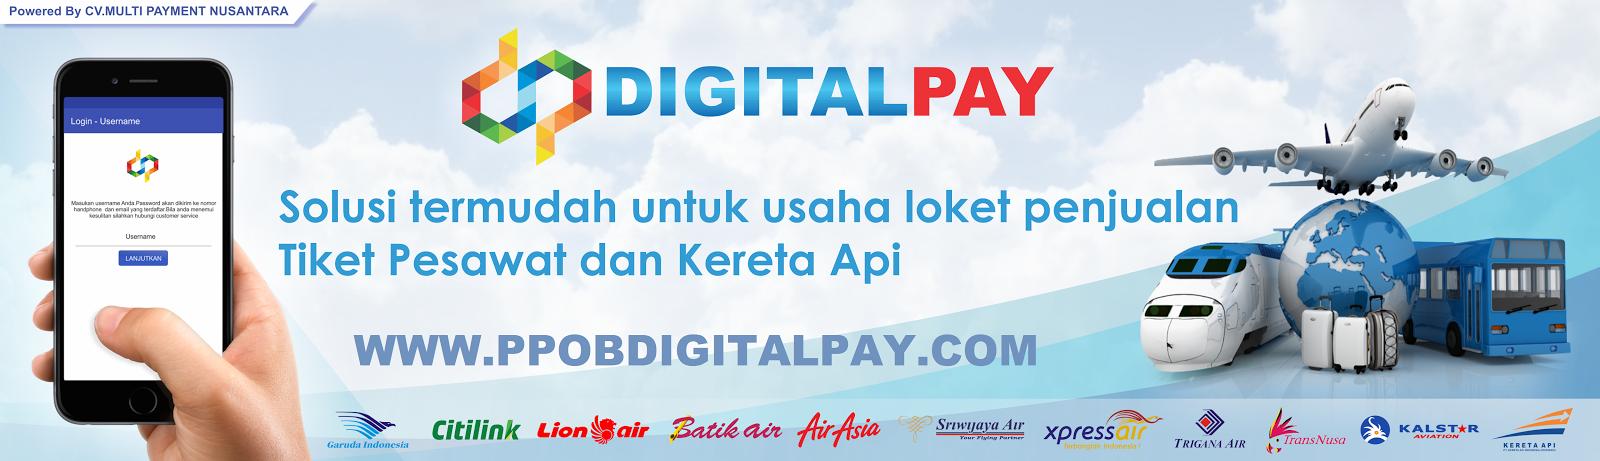 PPOB DIGITAL PAY - Agen Tiket Pesawat - Loket Pembayaran Online